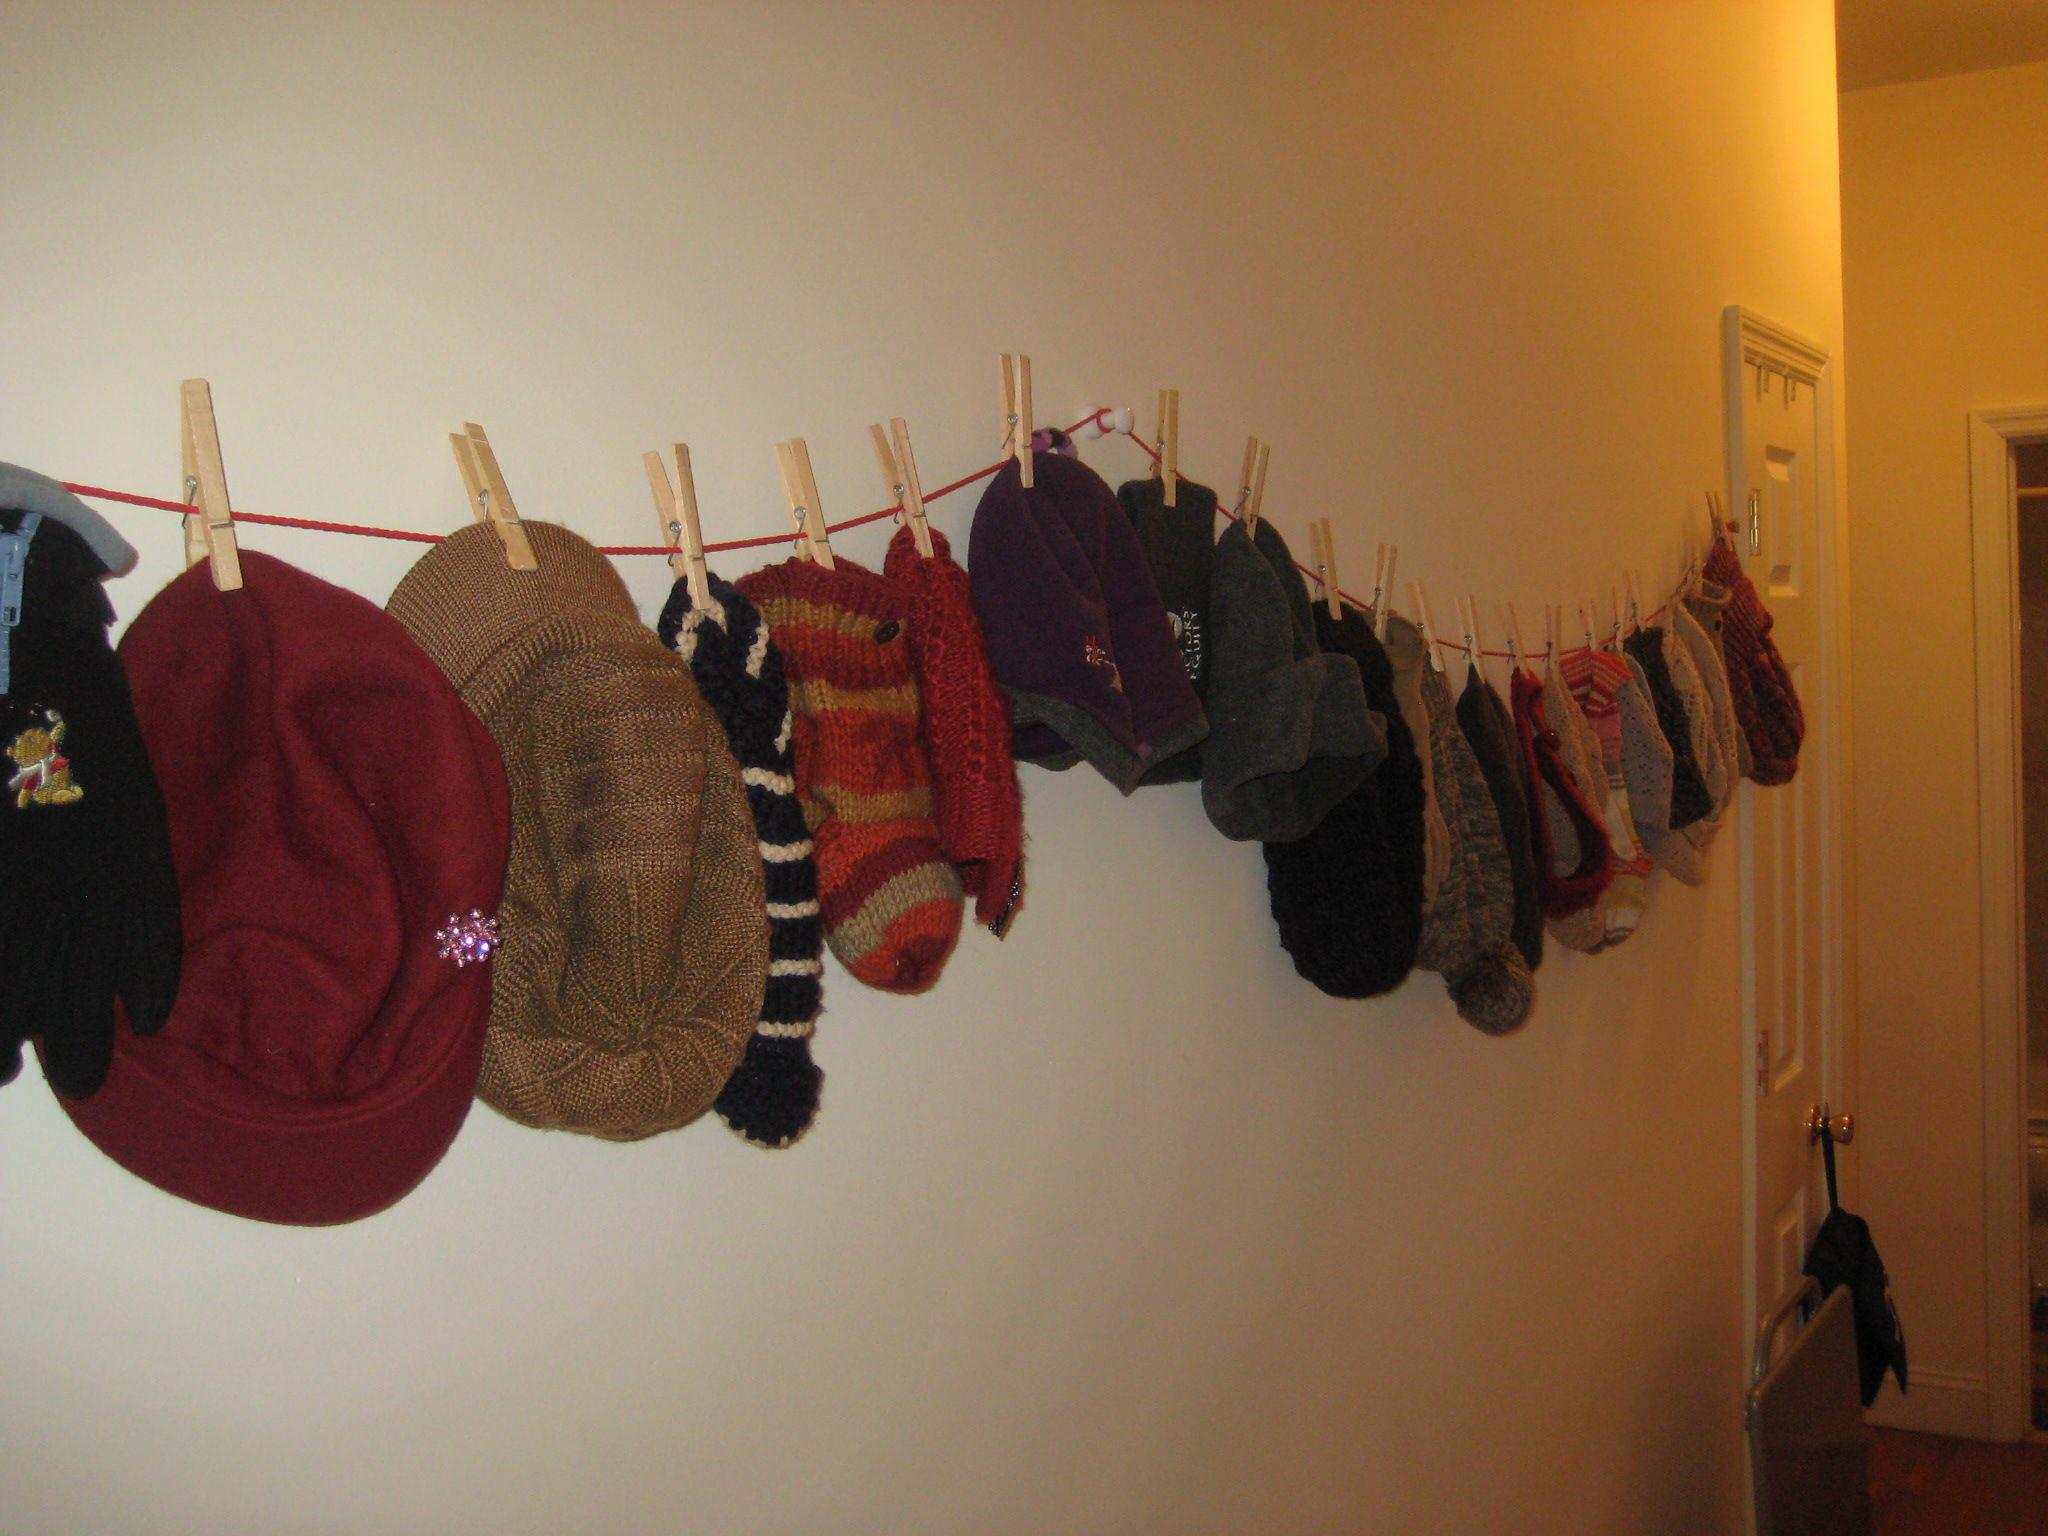 Quick Storage For All My Winter Hats And Gloves Winter Gear Organization Hat Storage Coat Closet Organization